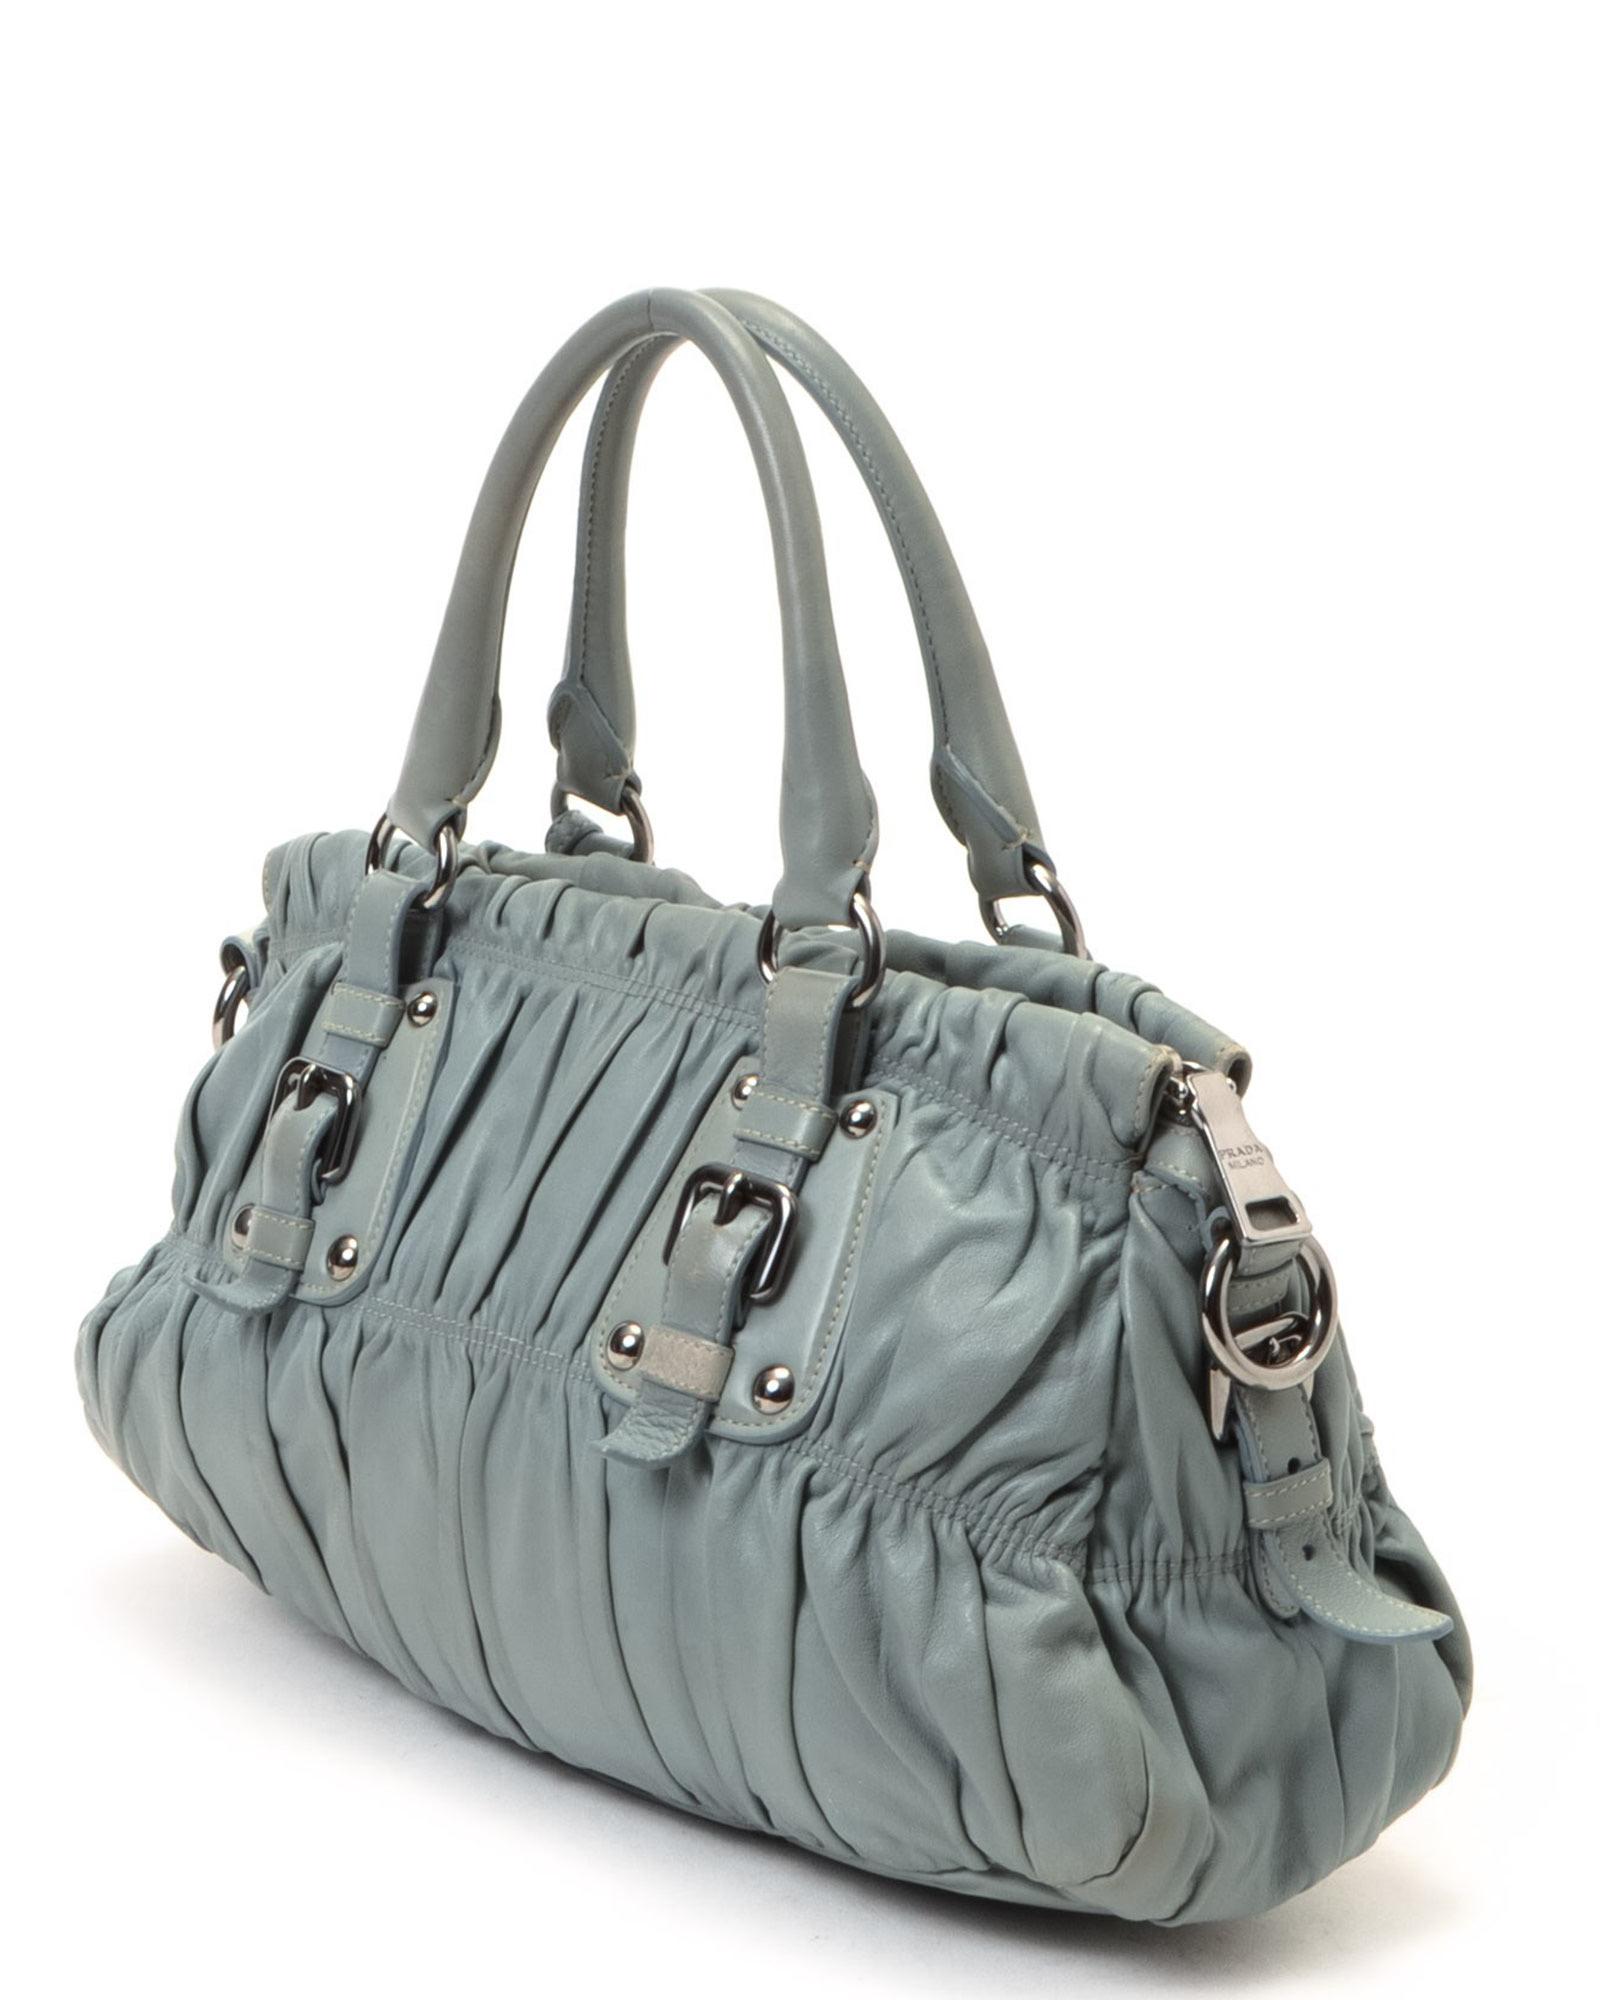 0f4a61edf007 Lyst - Prada Nappa Gaufre Bag - Vintage in Gray